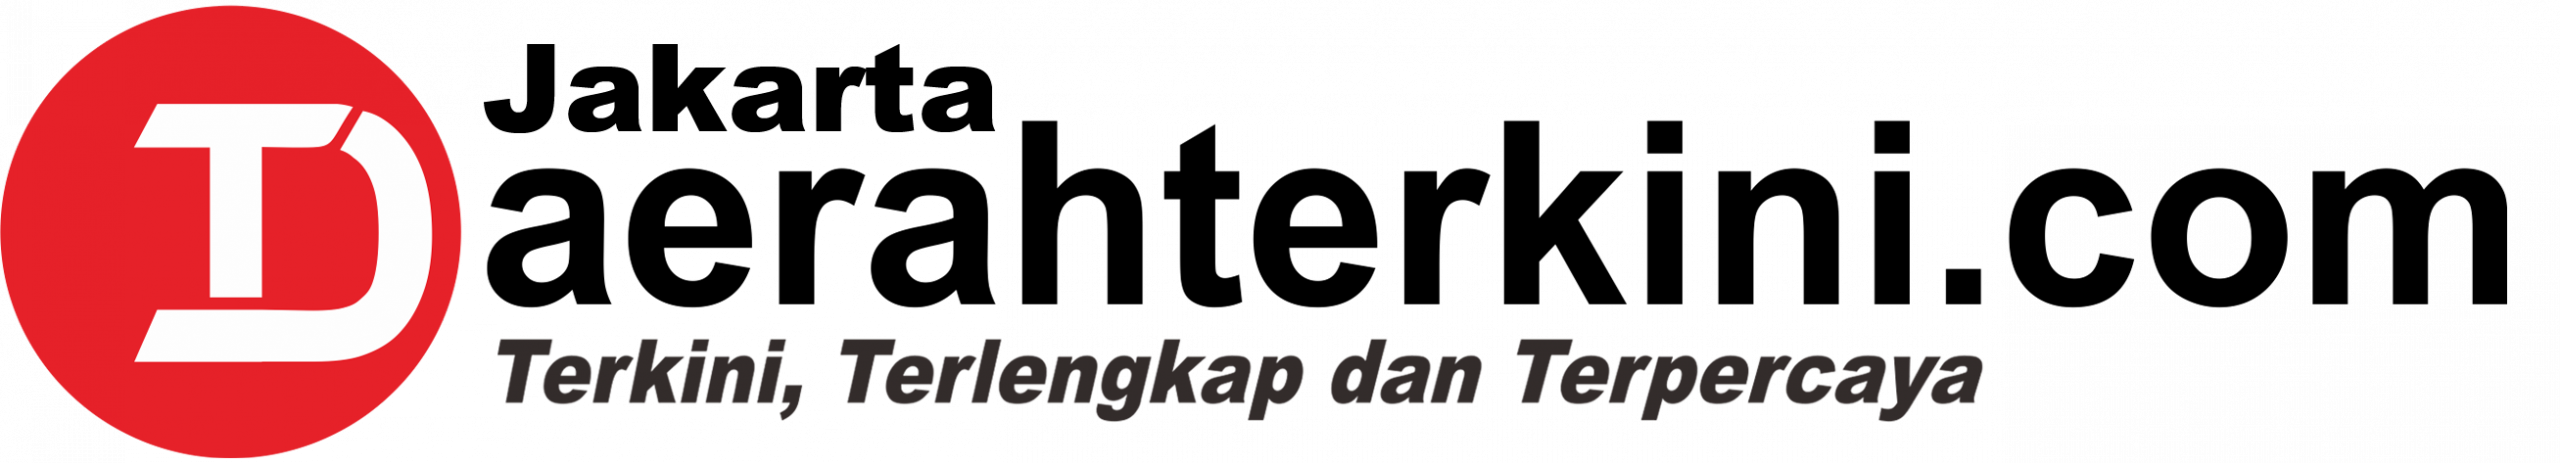 DKI Jakarta Daerah Terkini